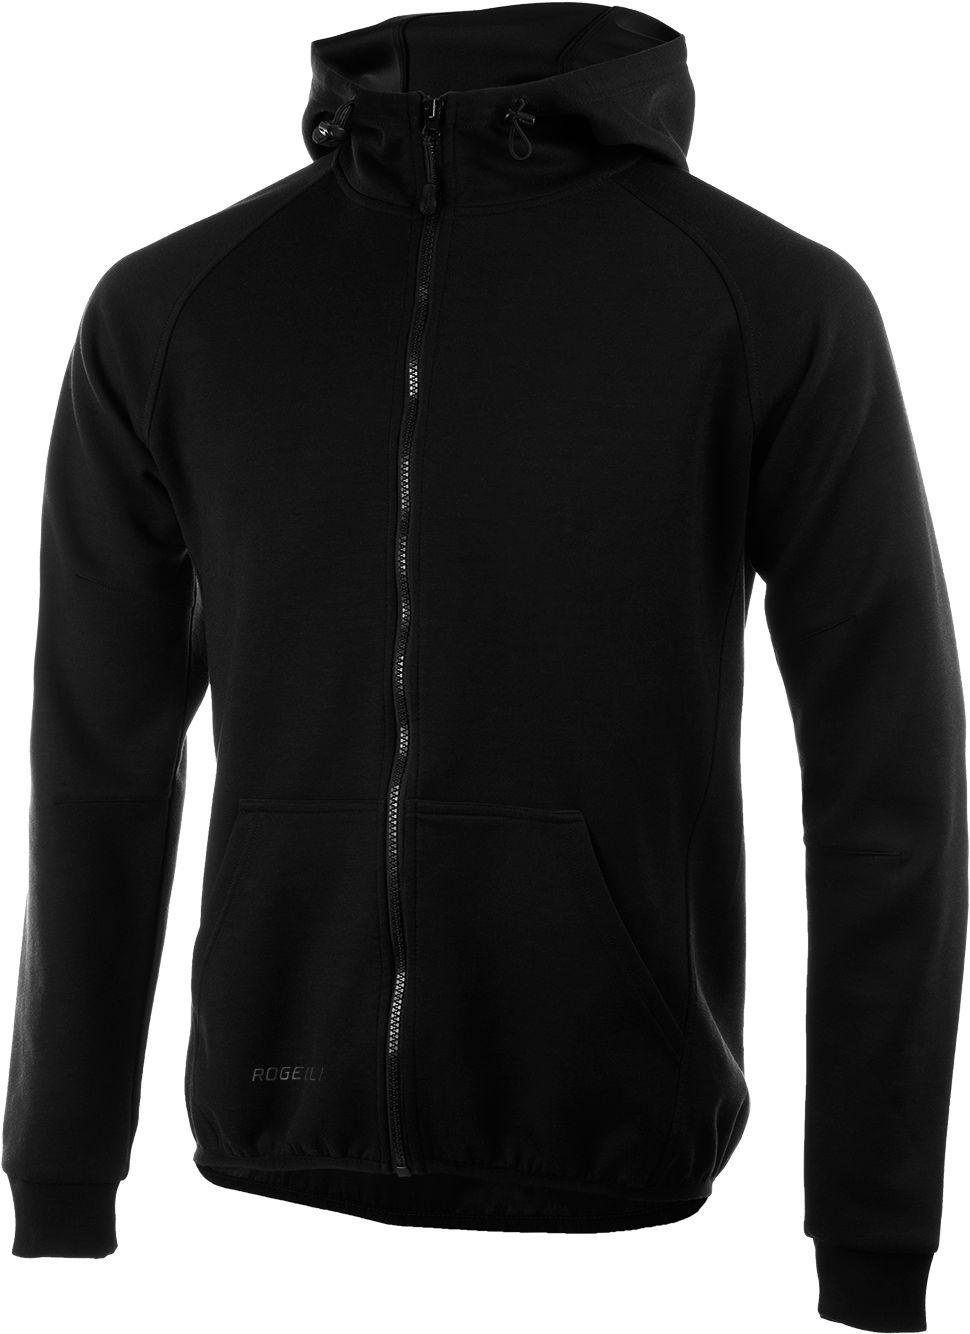 ROGELLI bluza męska z kapturem TRENING czarna Rozmiar: L,050.601.XL